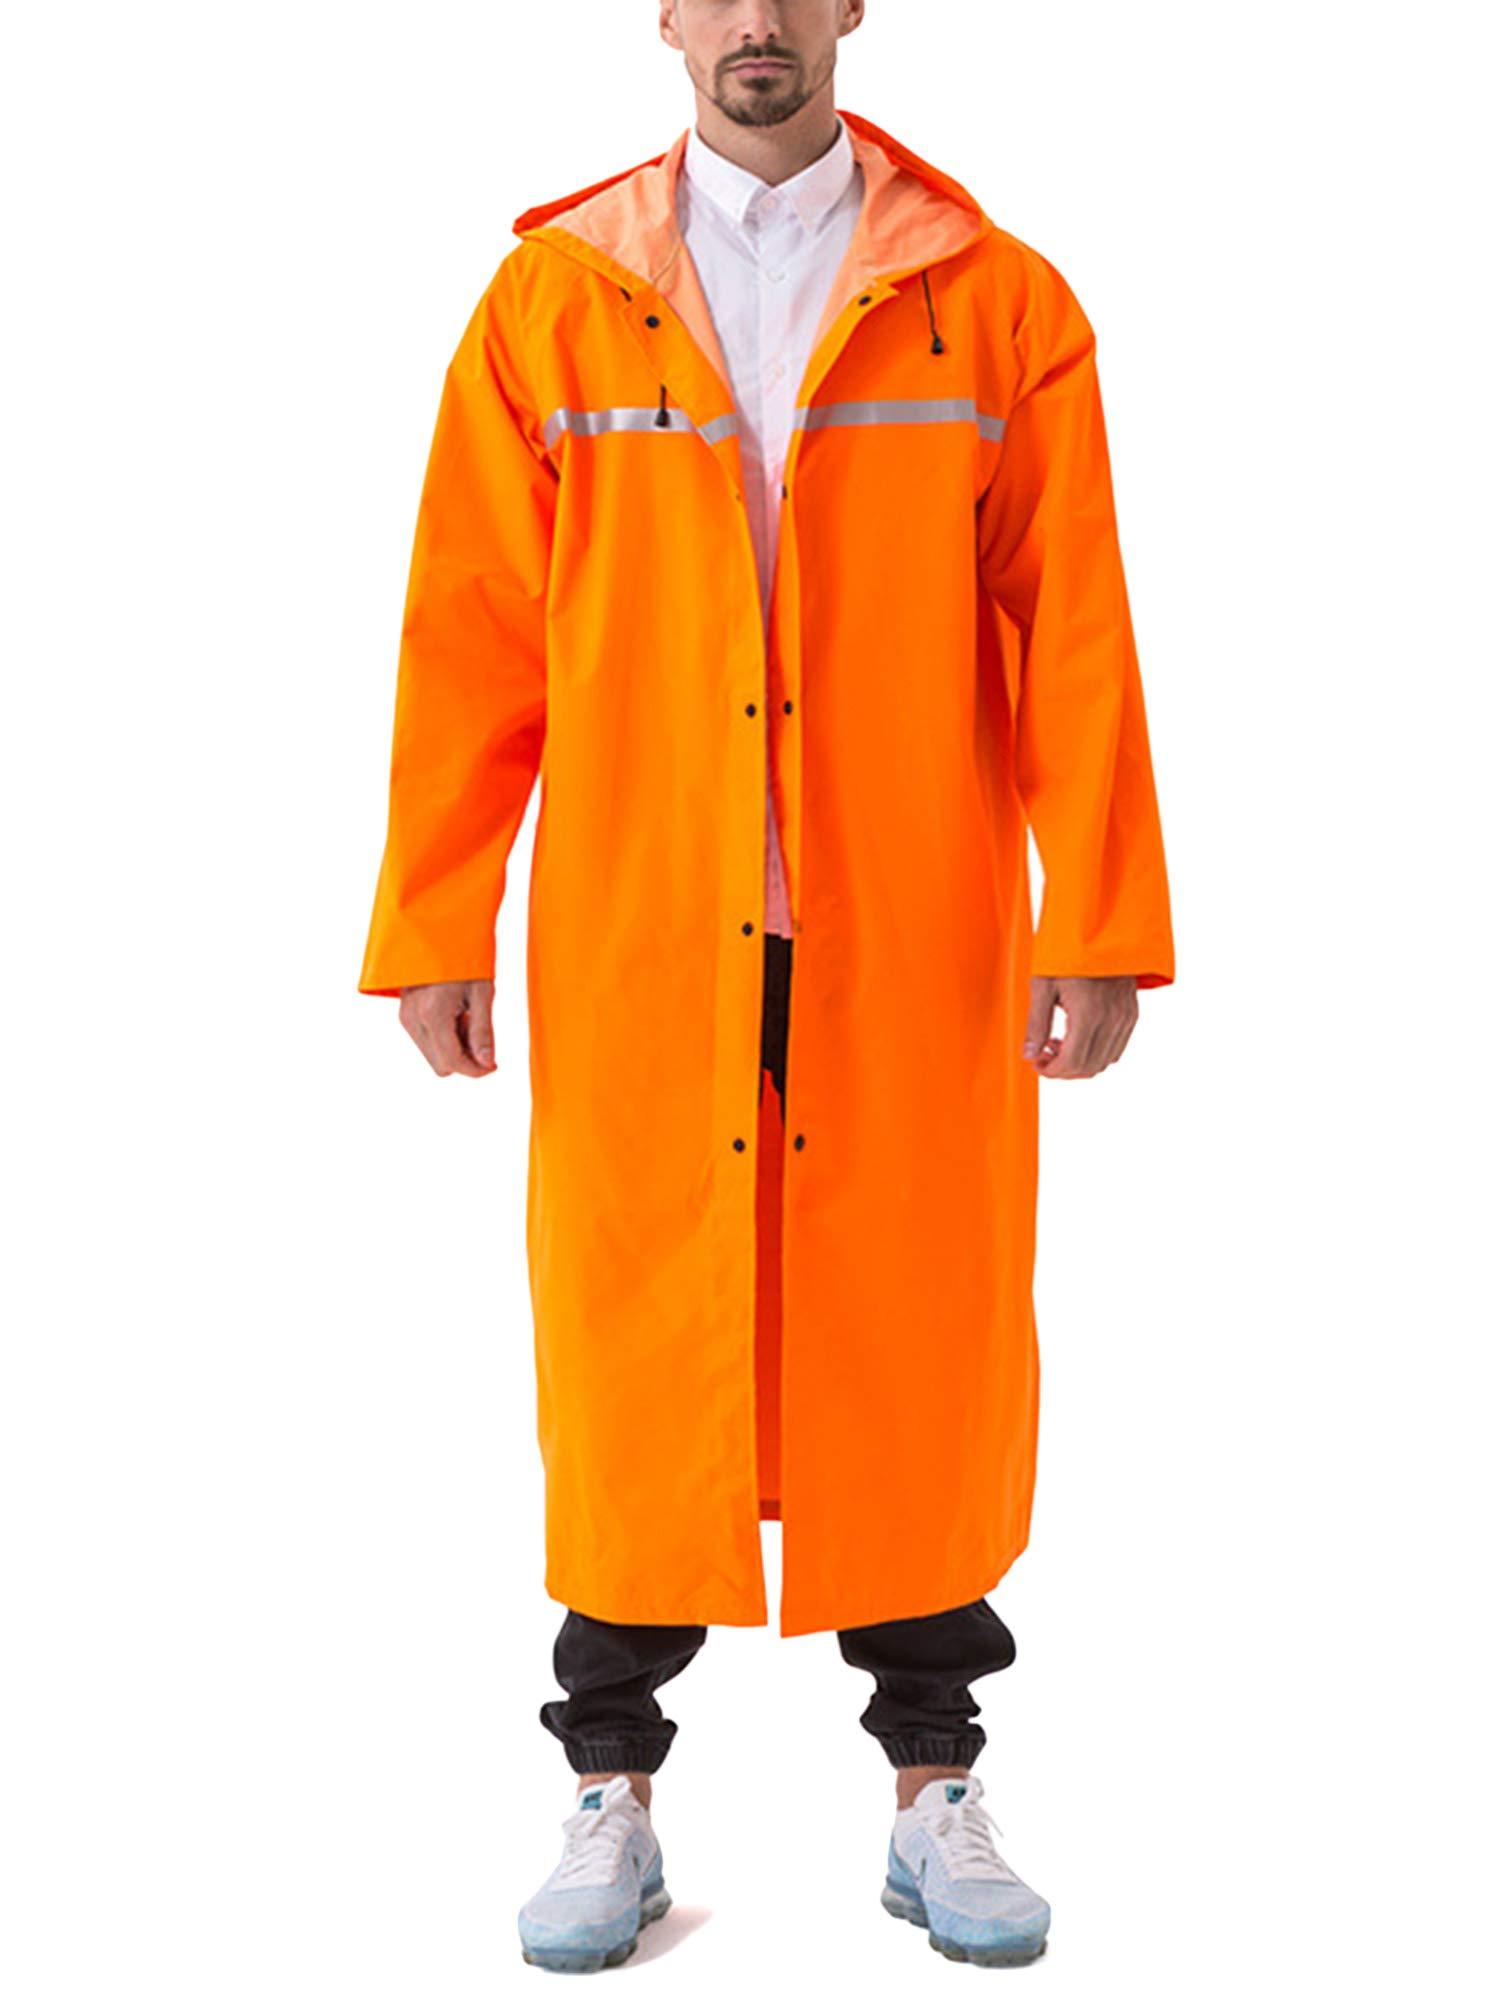 Raincoats for Men Rain Poncho Rainwear Waterproof Jackets for Men by MAGCOMSEN